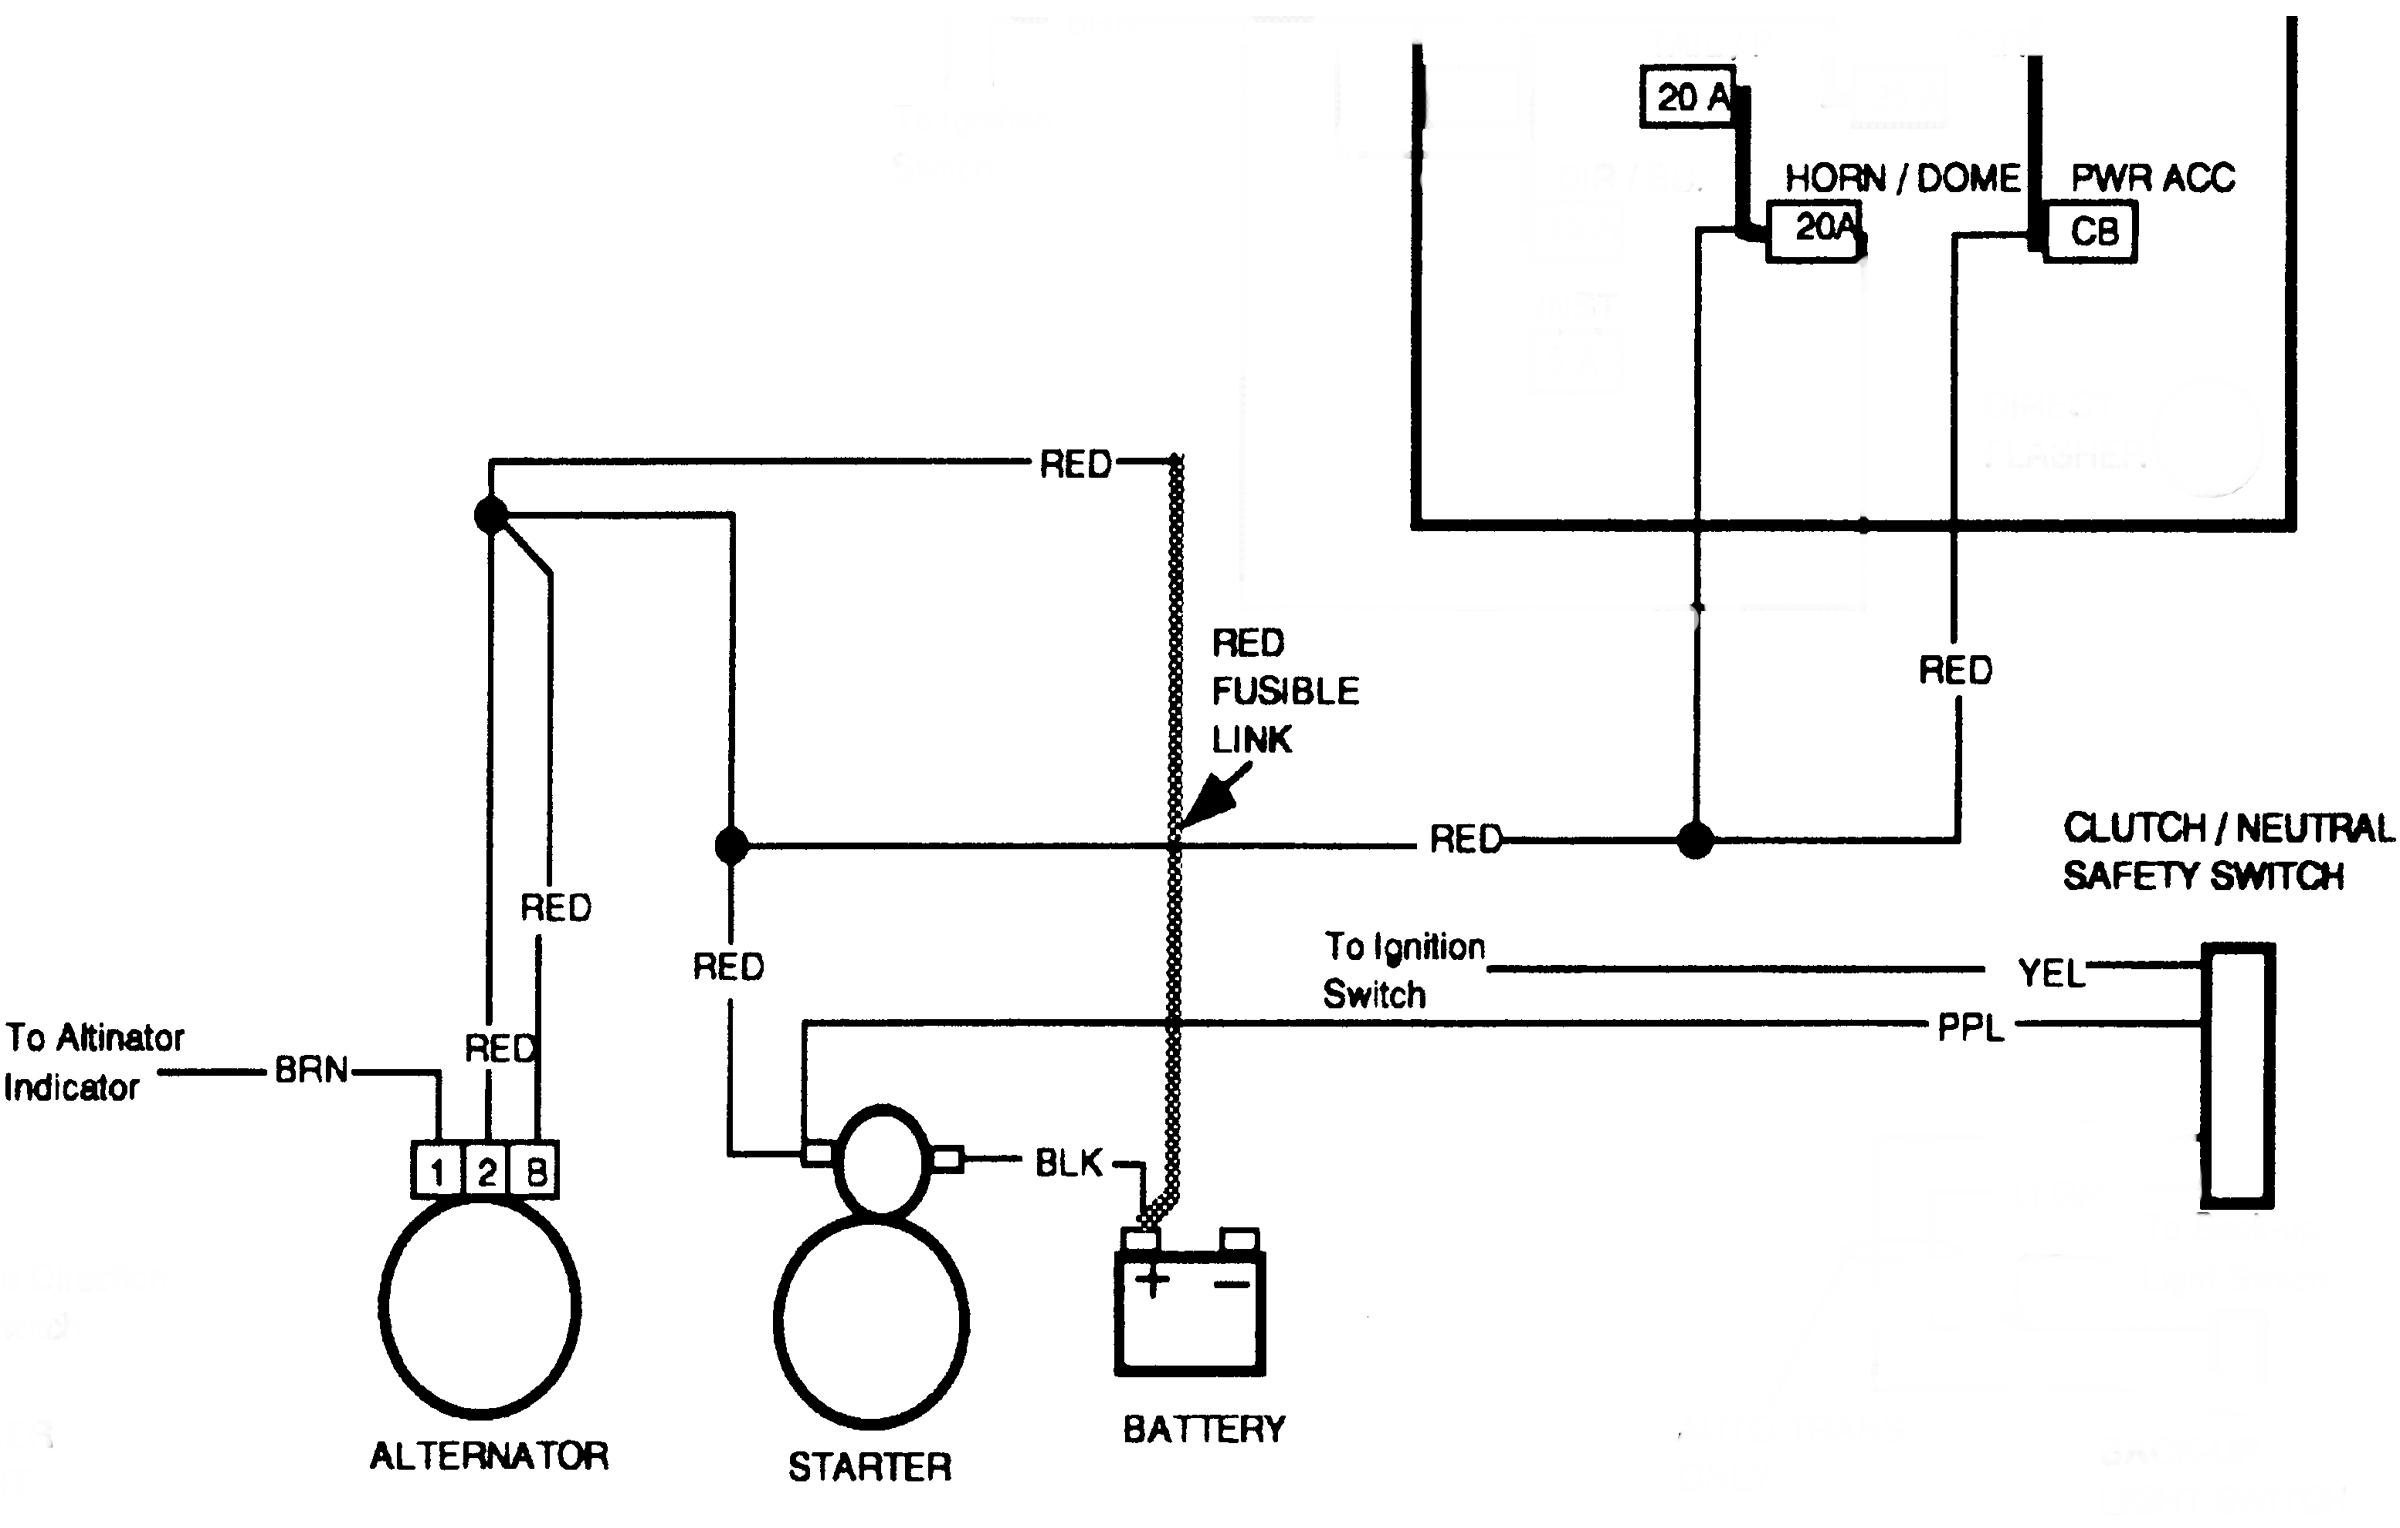 350 Alternator Wiring Diagram | Wiring Diagram - Alternator Wiring Diagram Chevy 350